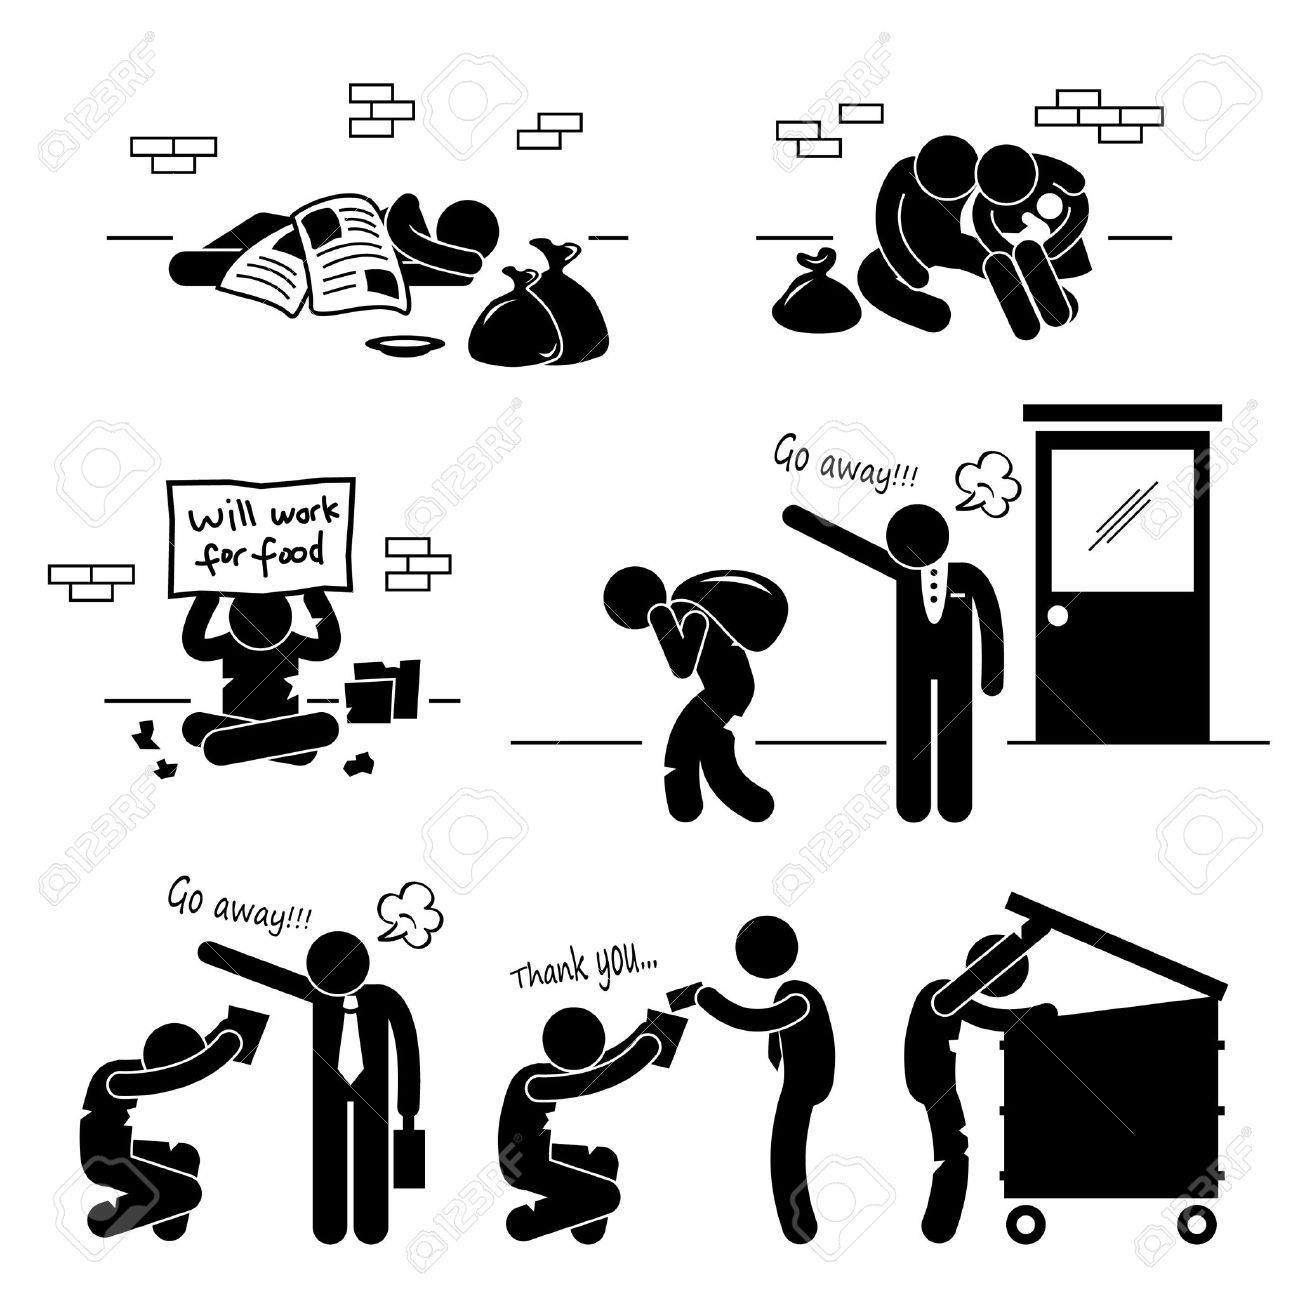 Homeless Man Family Beggar Jobless Stick Figure Pictogram Icon Stick Figures Man Clipart Pictogram